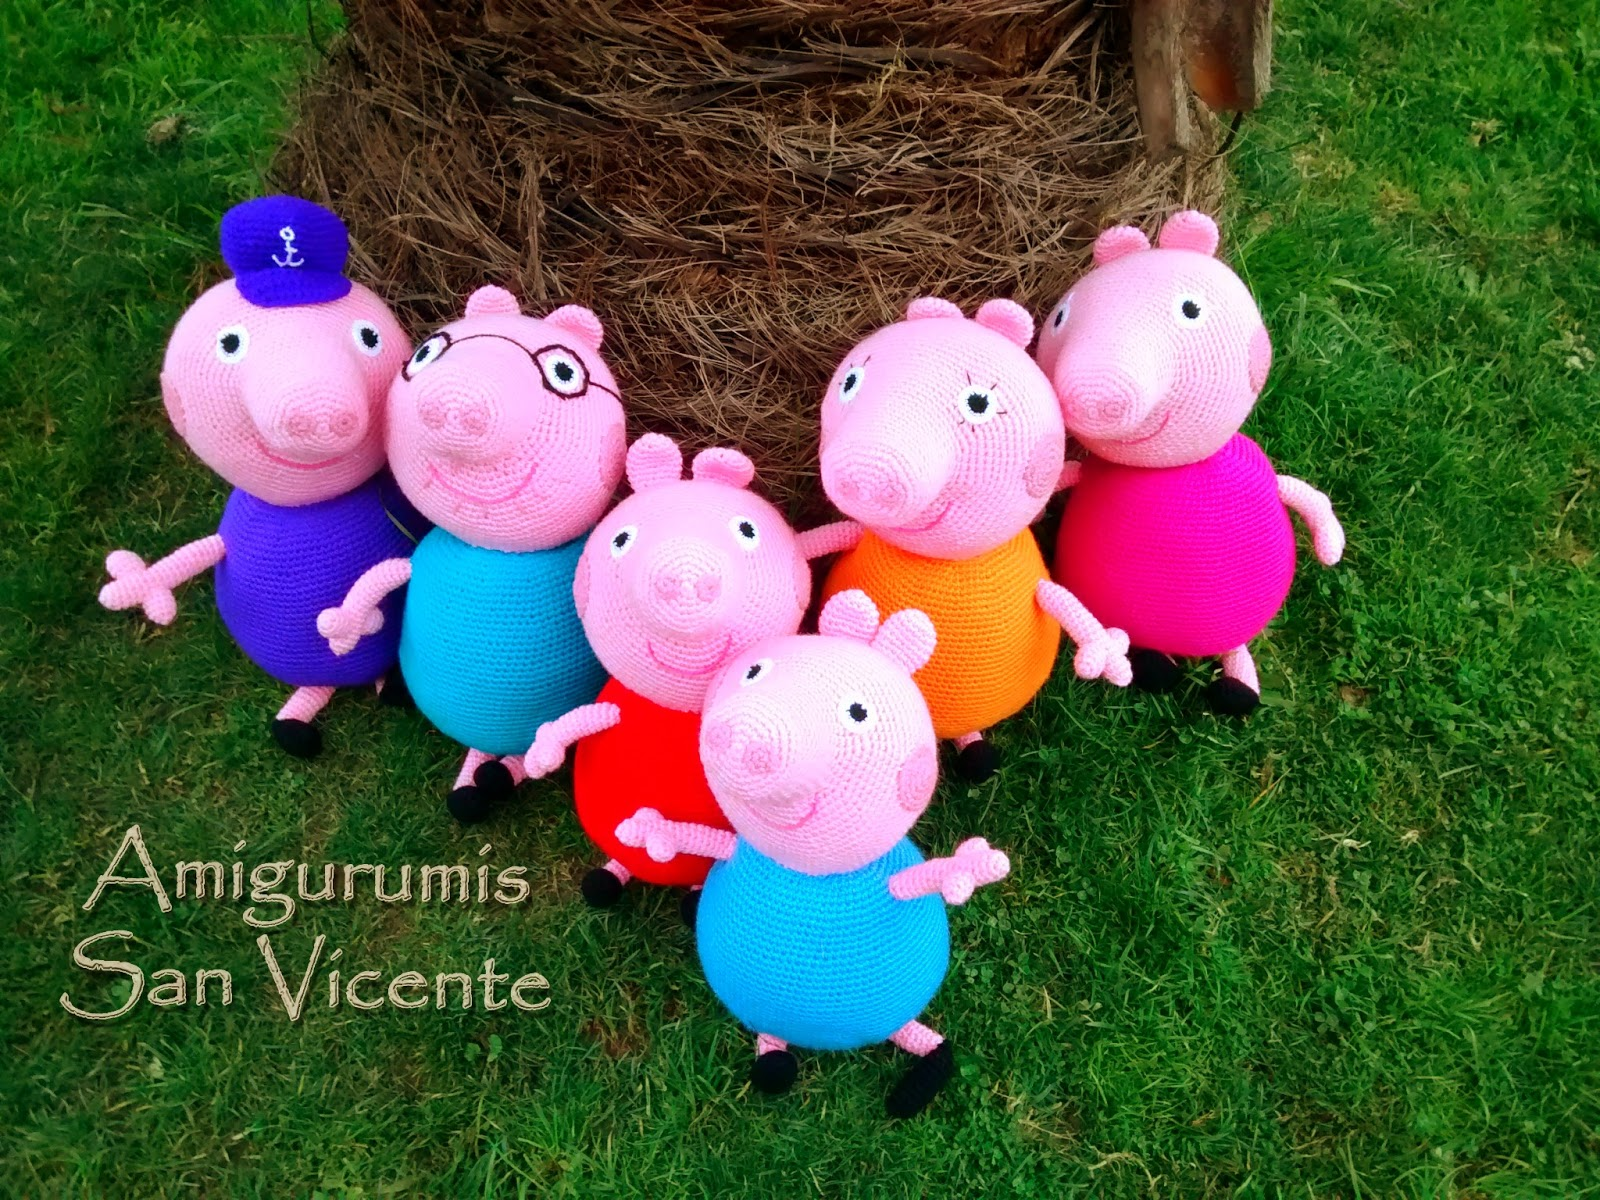 Peppa Pig amigurumi artedetei | Peppa pig amigurumi, Patrones ... | 1200x1600